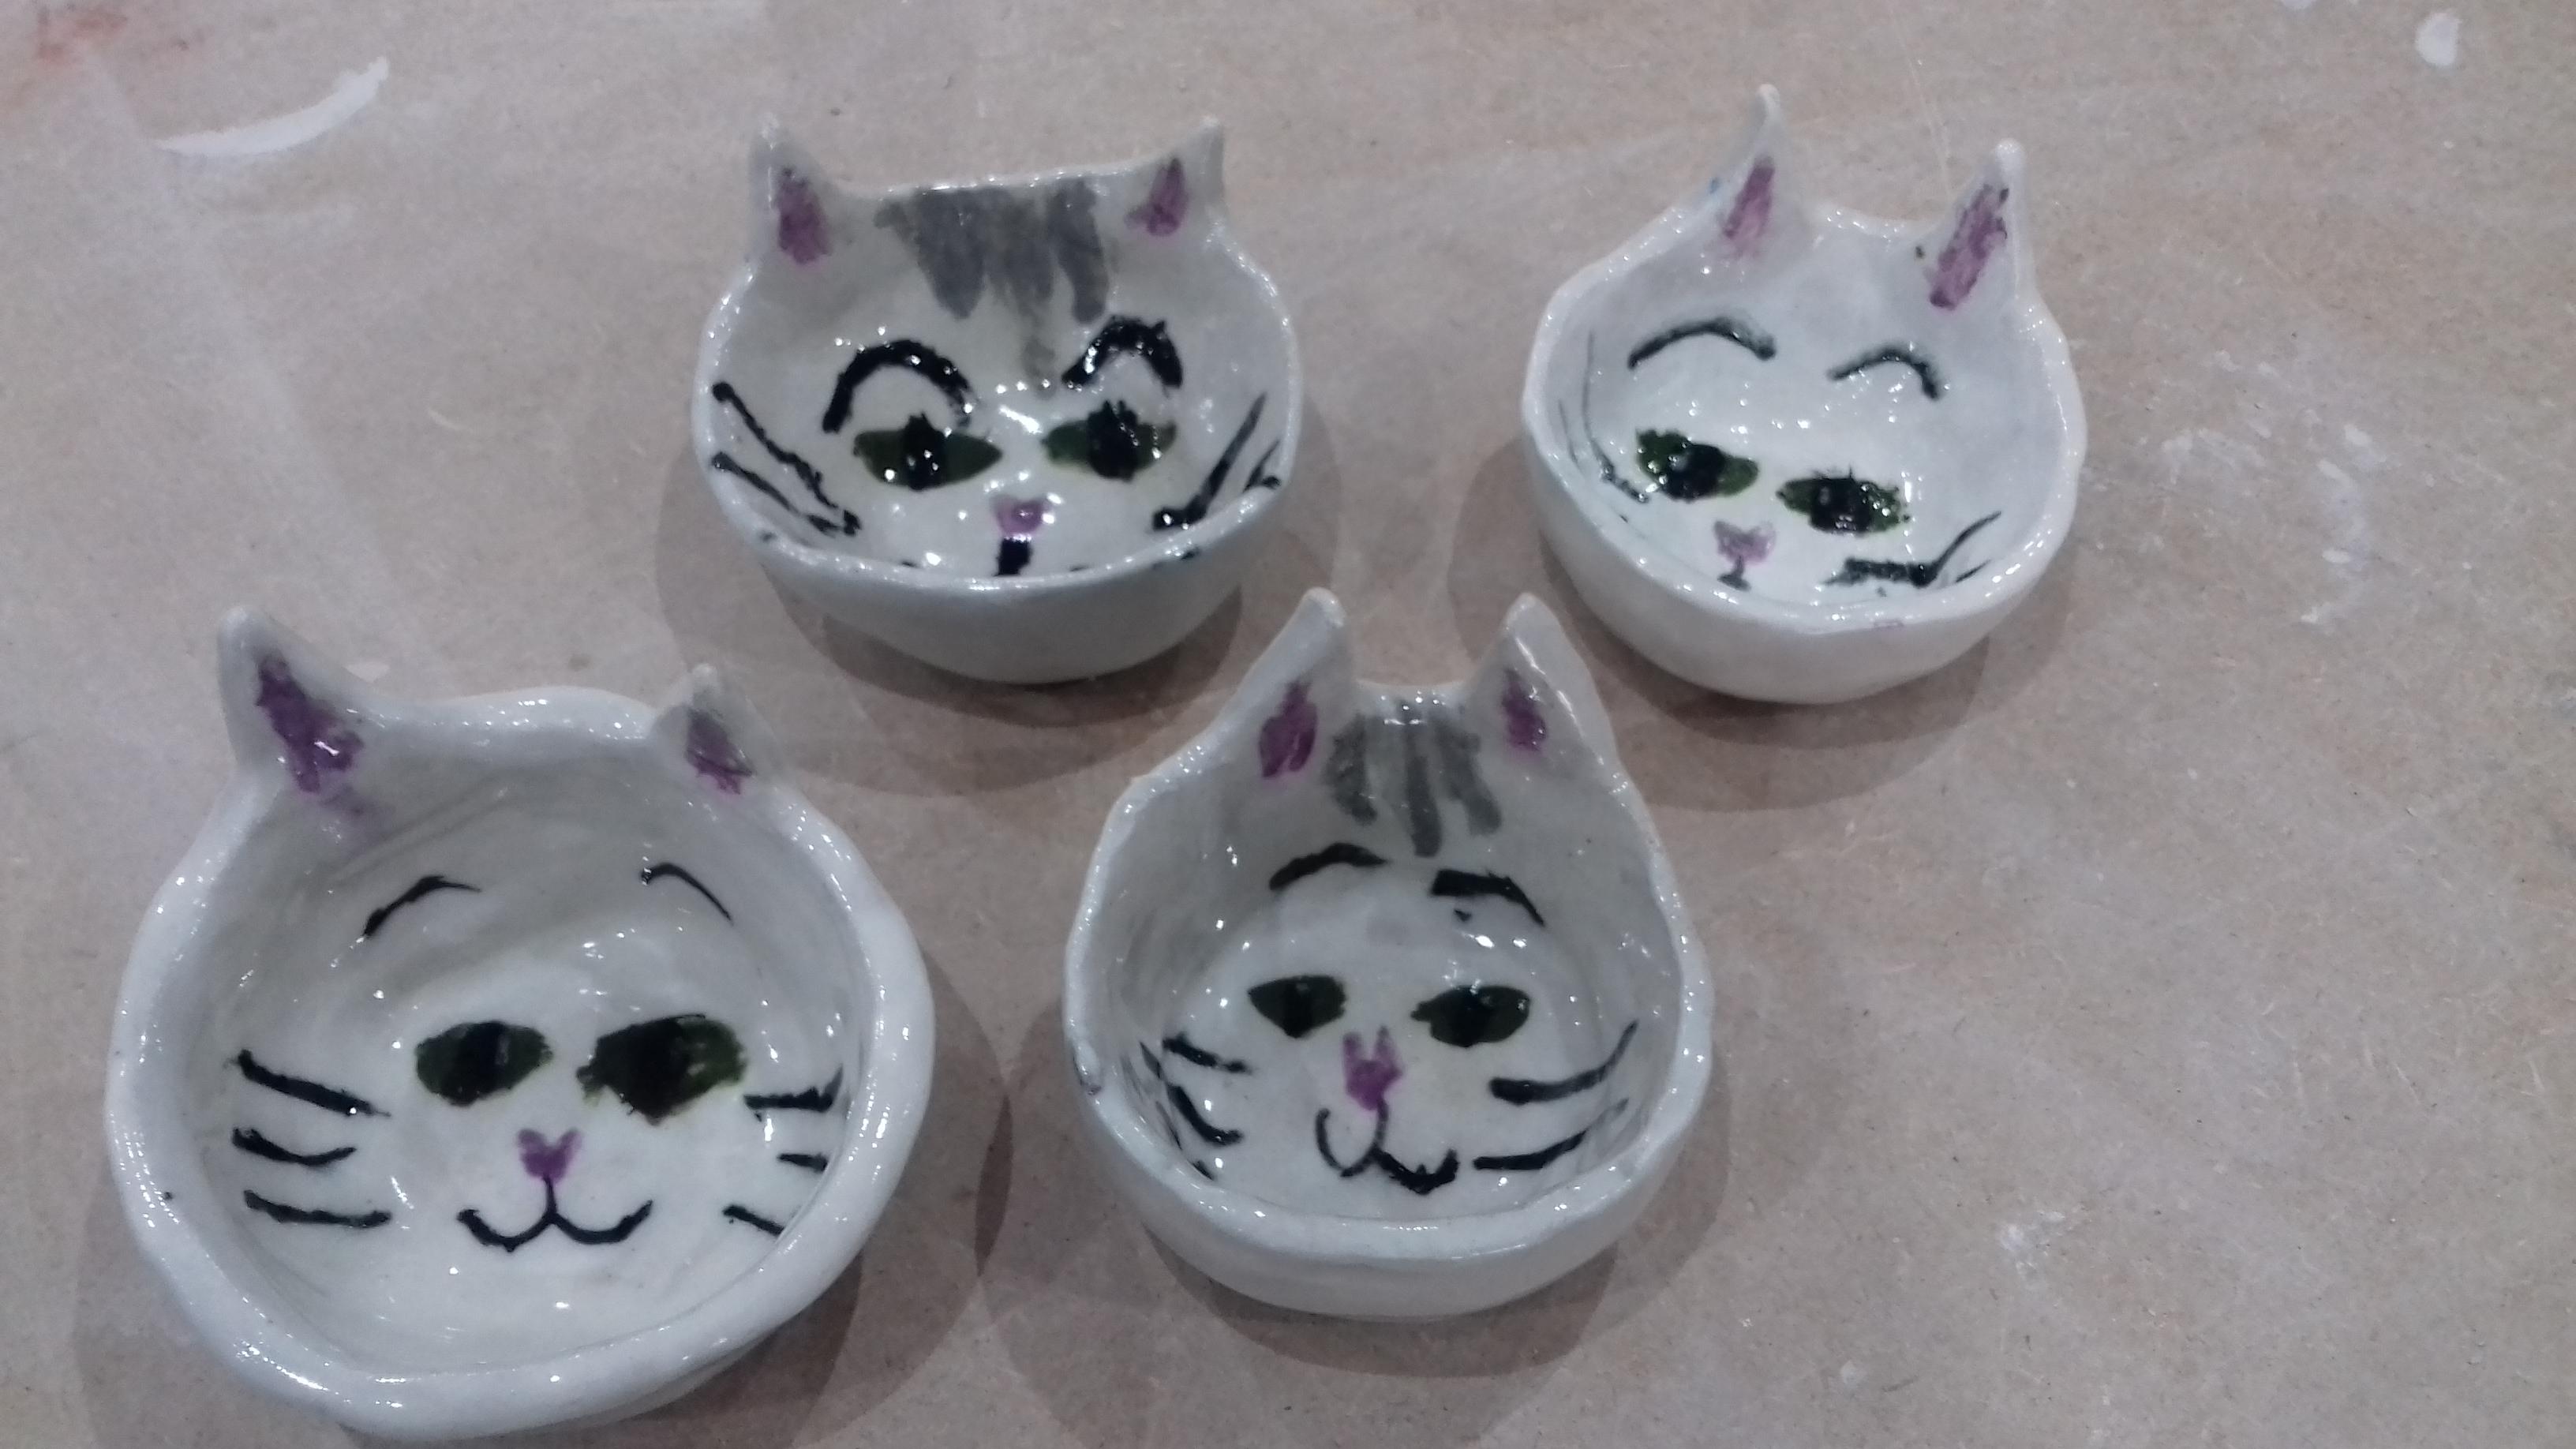 Cat bowls by Esme